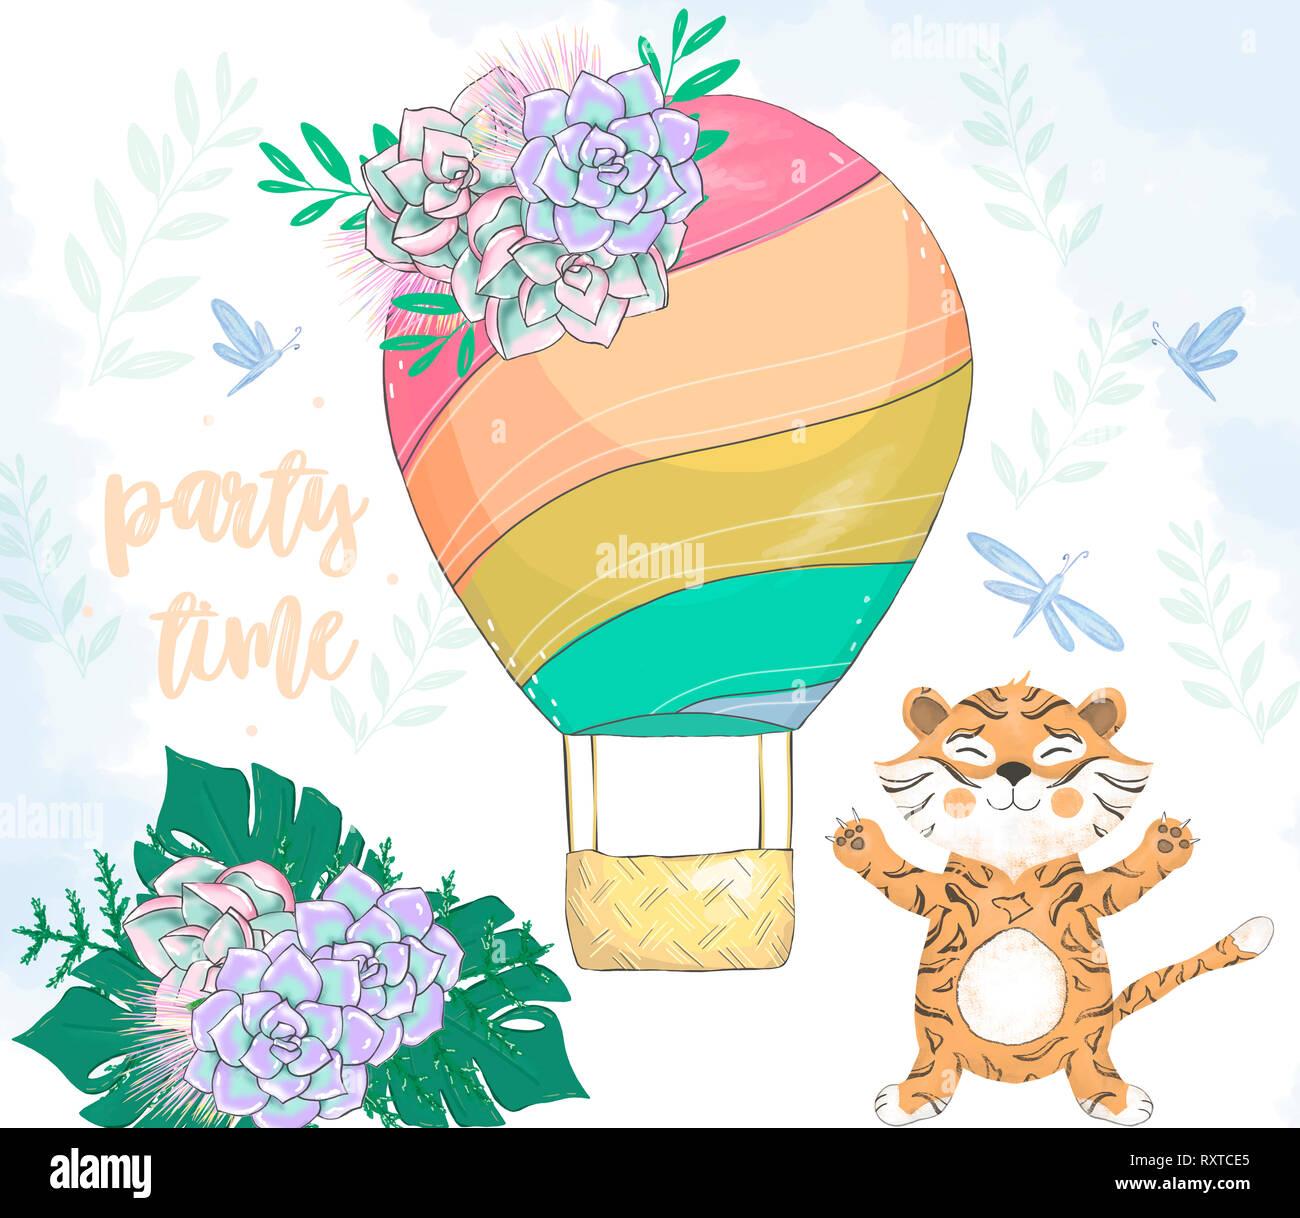 Tigre digital dibujo animal lindo arte de clip Imagen De Stock